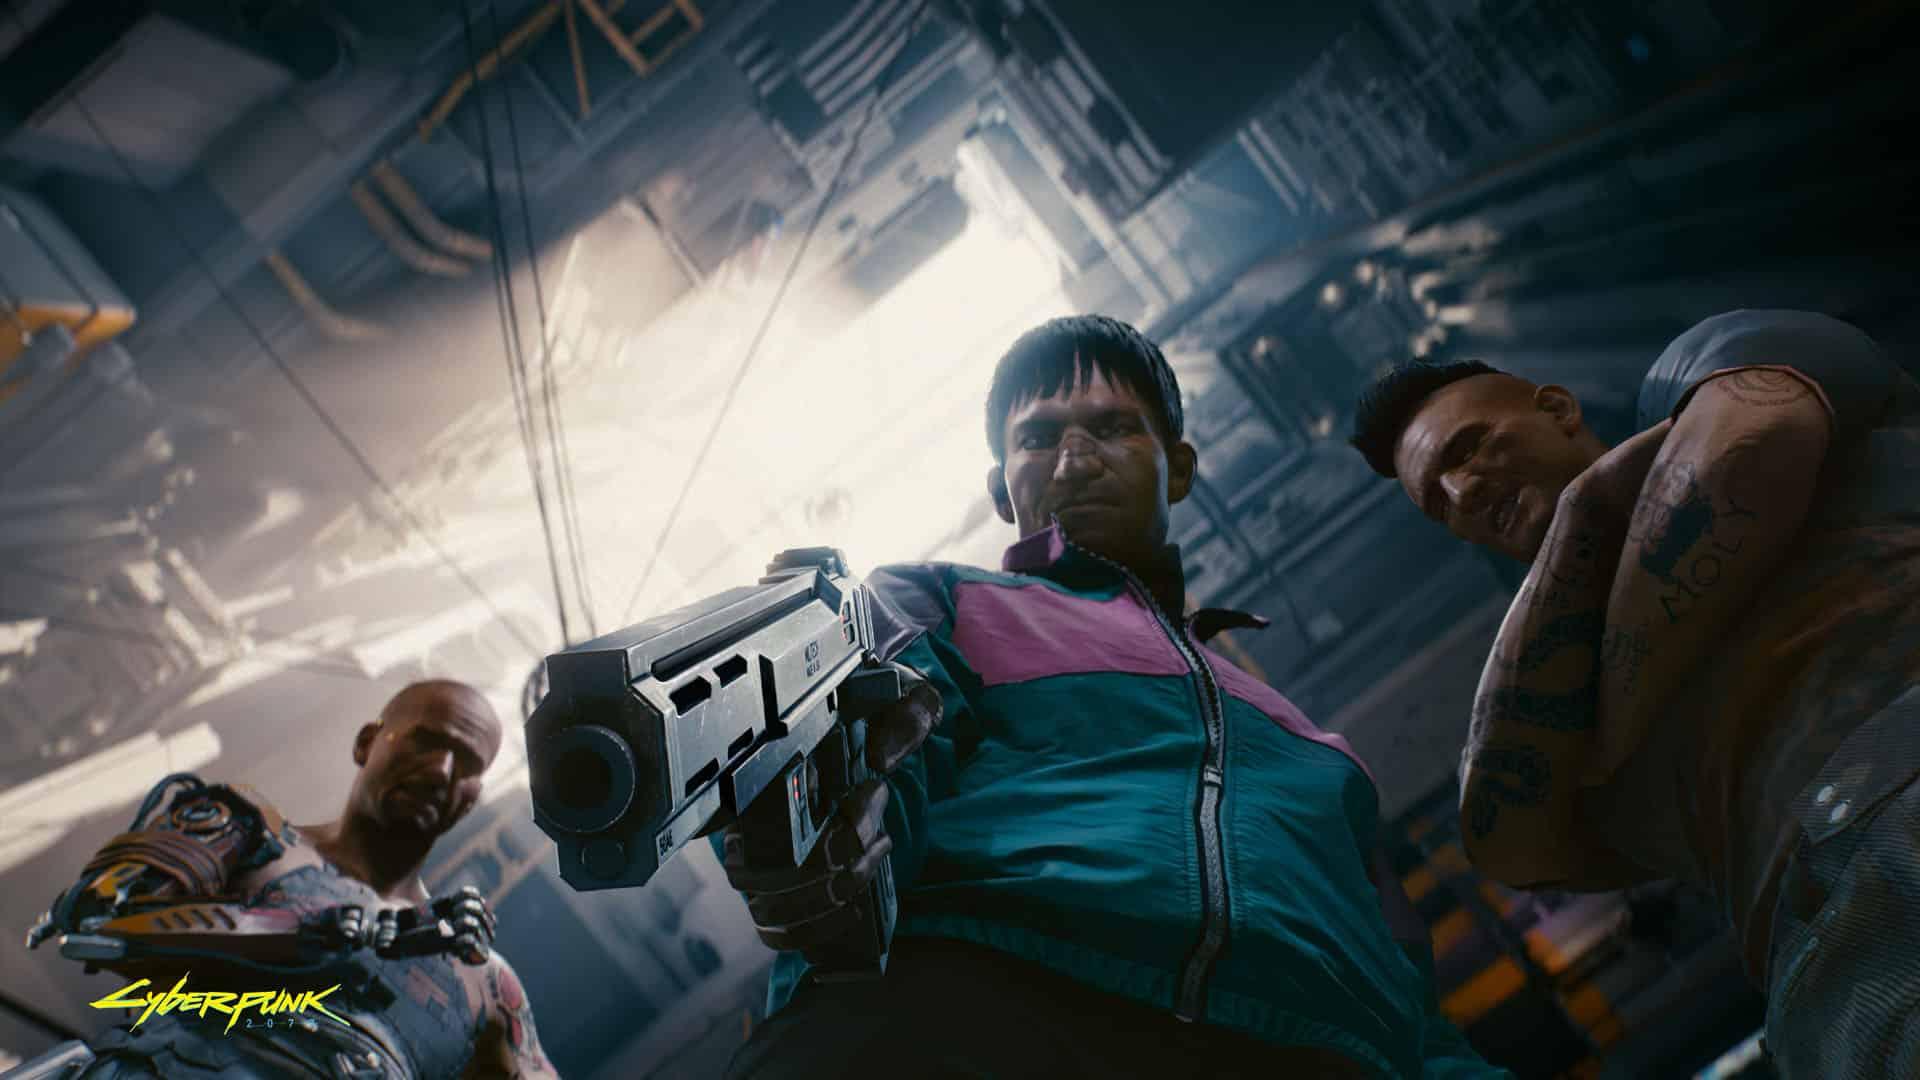 Cyberpunk 2077 cd projekt red first person cutscenes